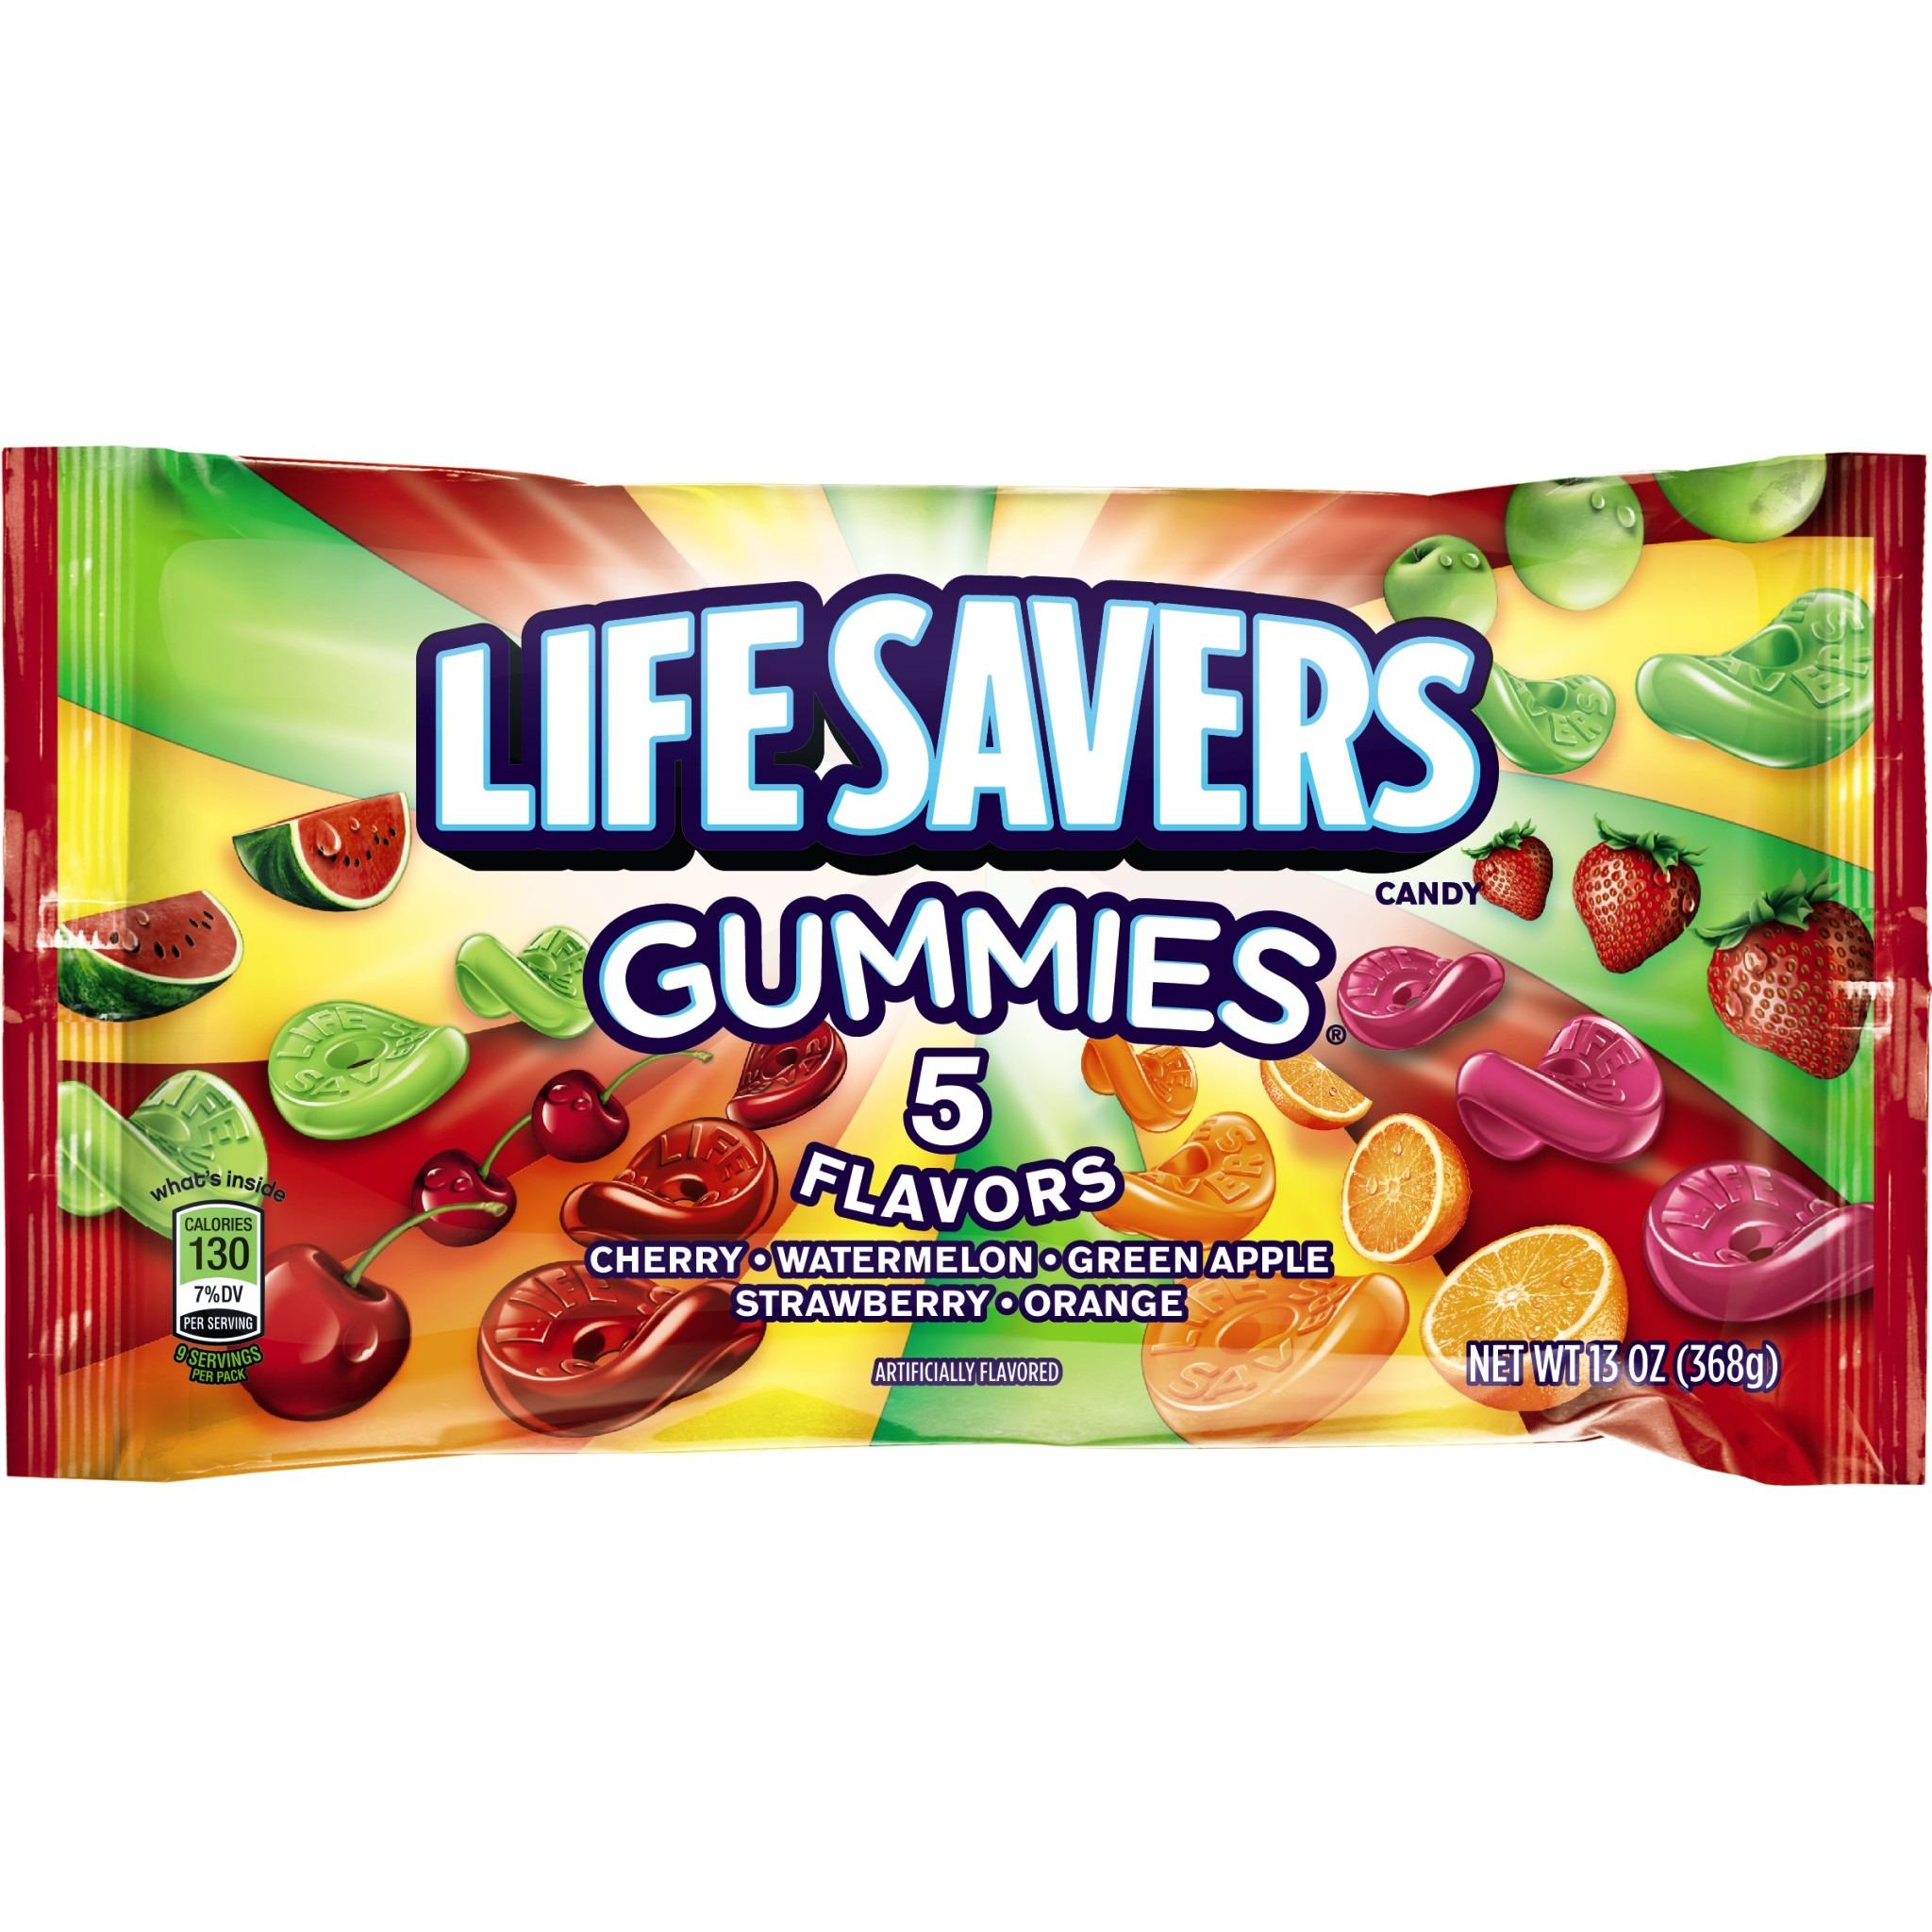 Life Savers 5 Flavors Gummies Candy Bag, 13 ounce